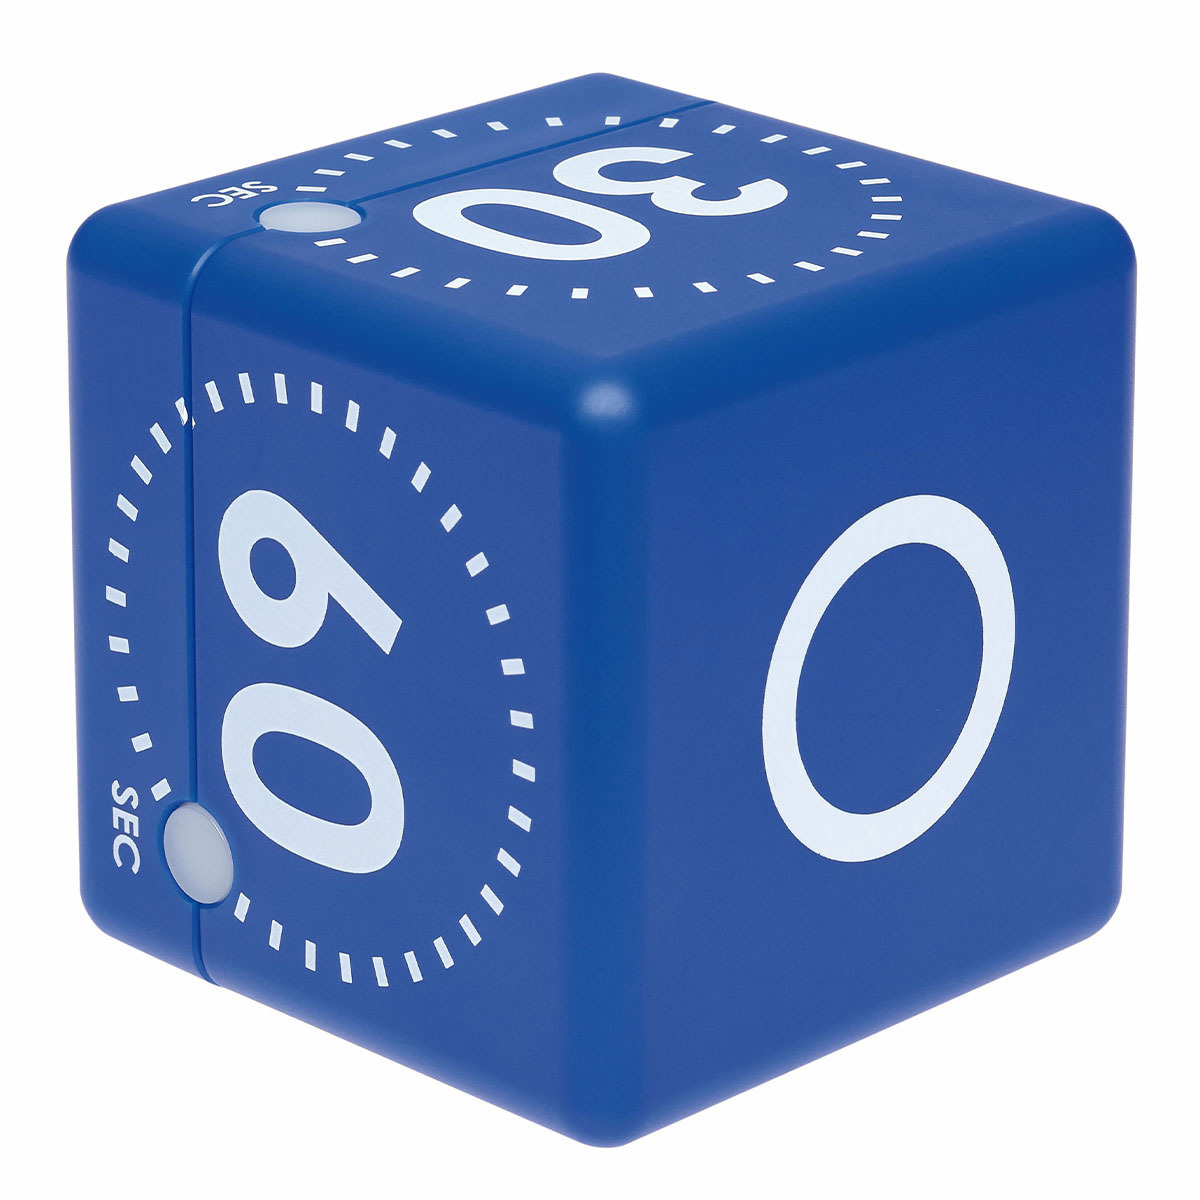 38-2036-06-digitaler-würfel-timer-cube-timer-ansicht-1200x1200px.jpg